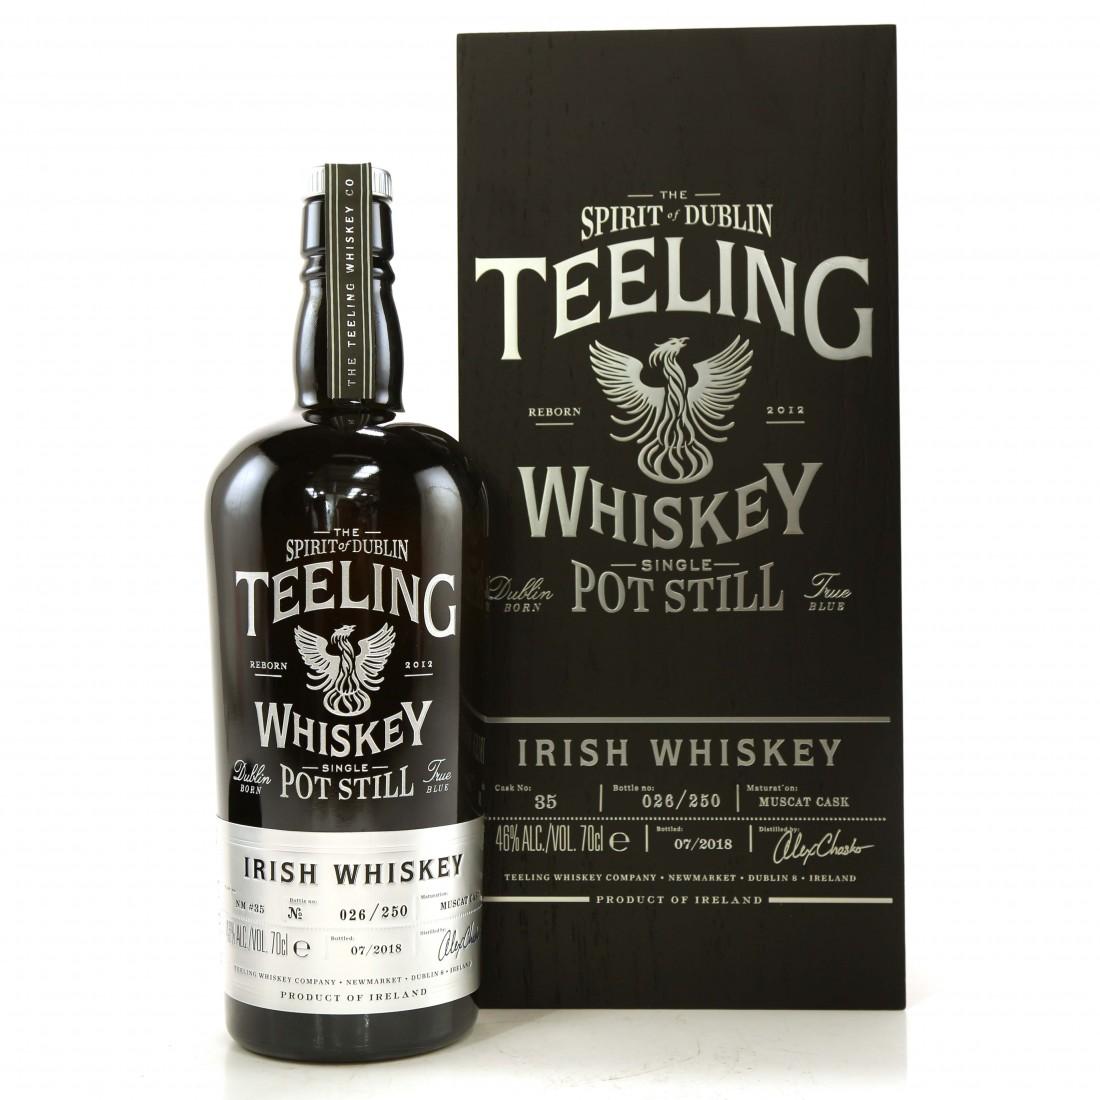 Teeling Celebratory Single Pot Still Whiskey / Bottle #026